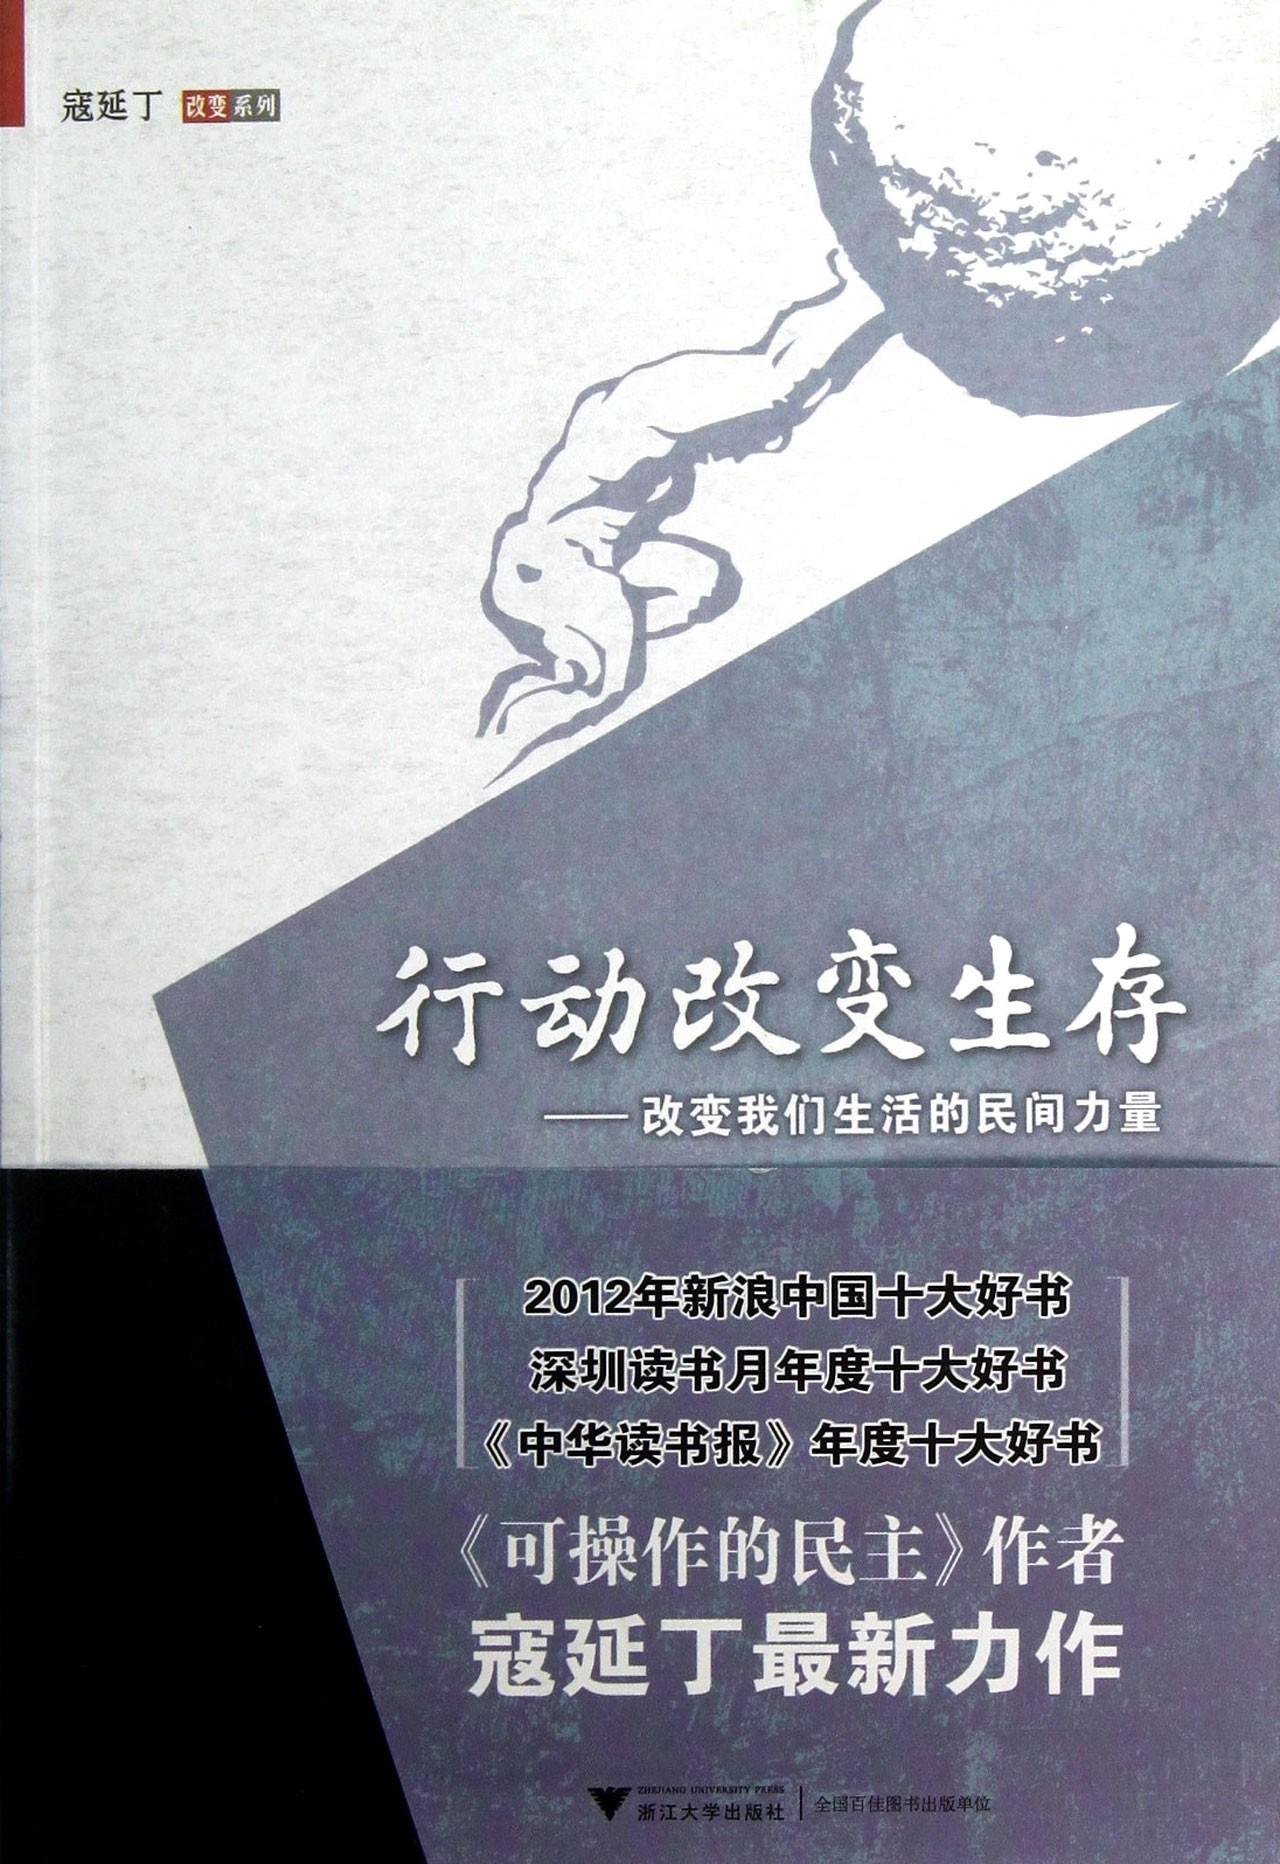 Kou Yanding